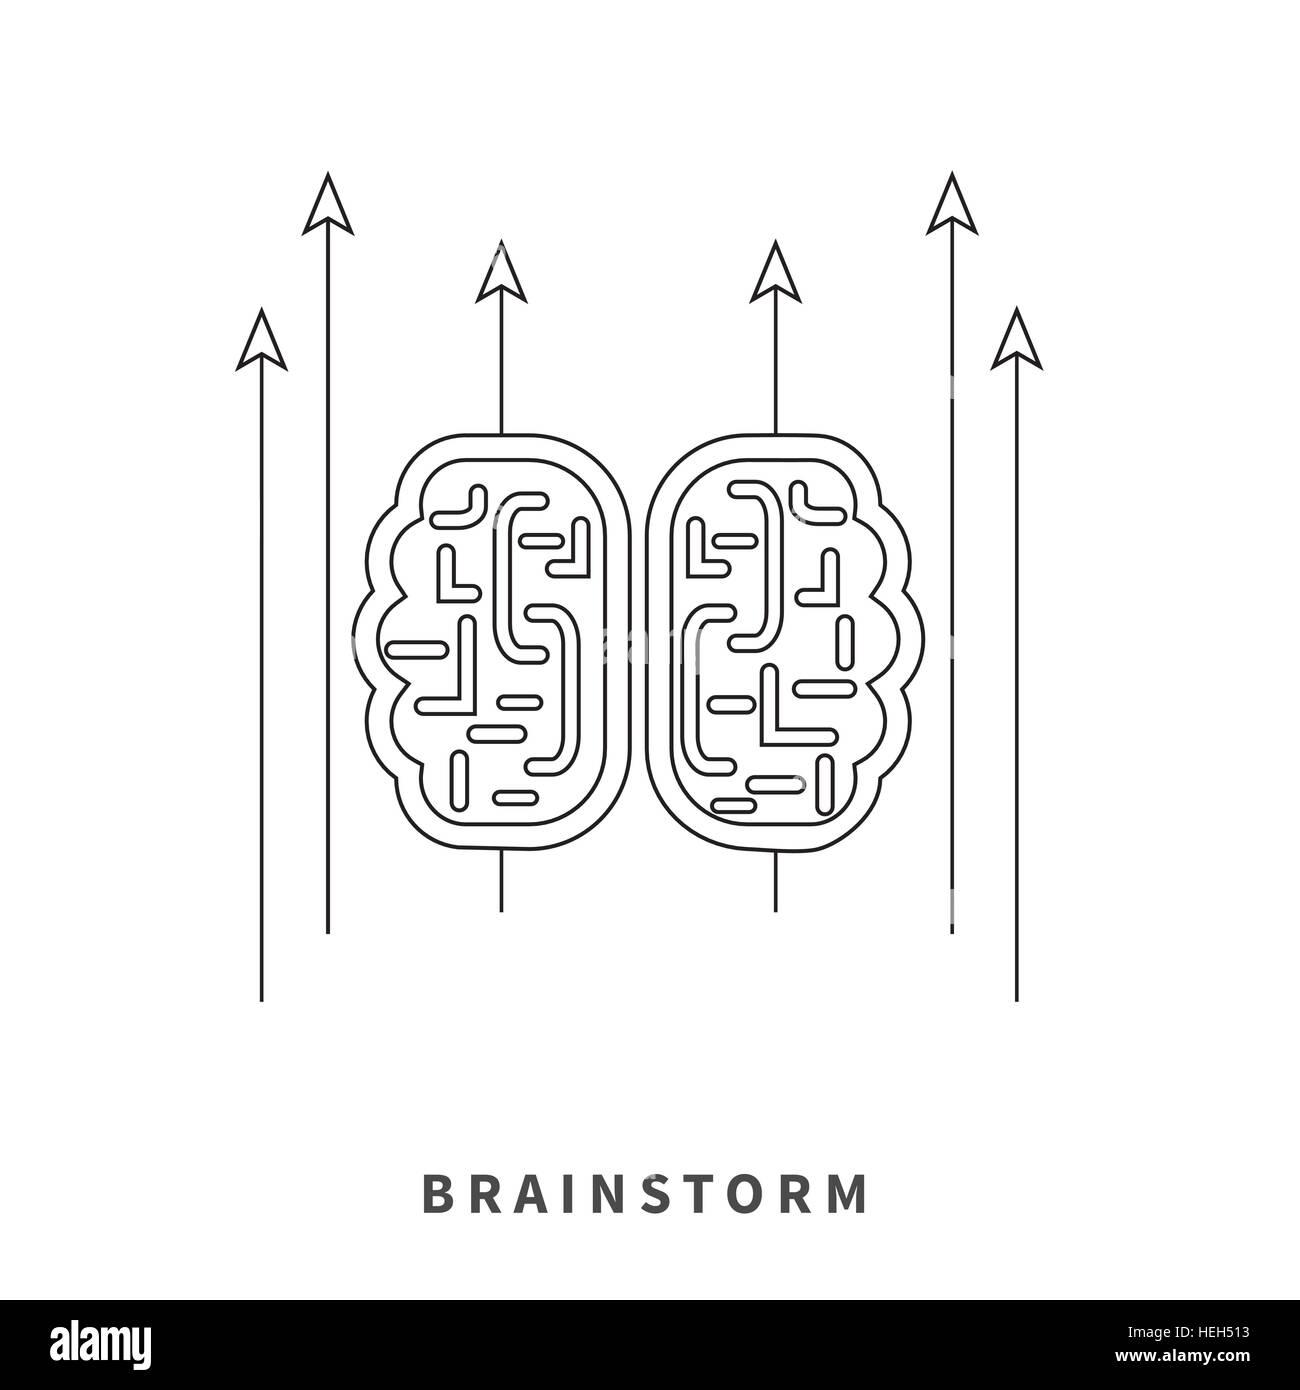 Brainstorm Design Concept Brain Idea Thinking Mind Map Creative Stock Vector Image Art Alamy